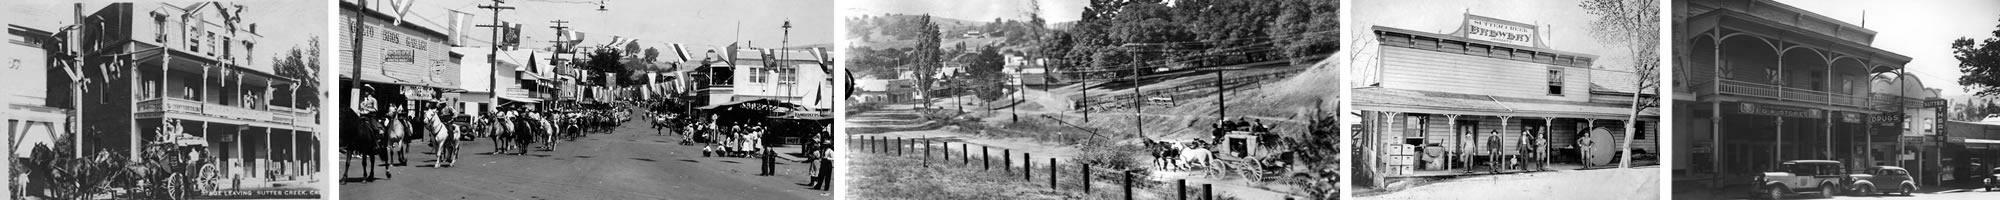 Historic Sutter Creek California